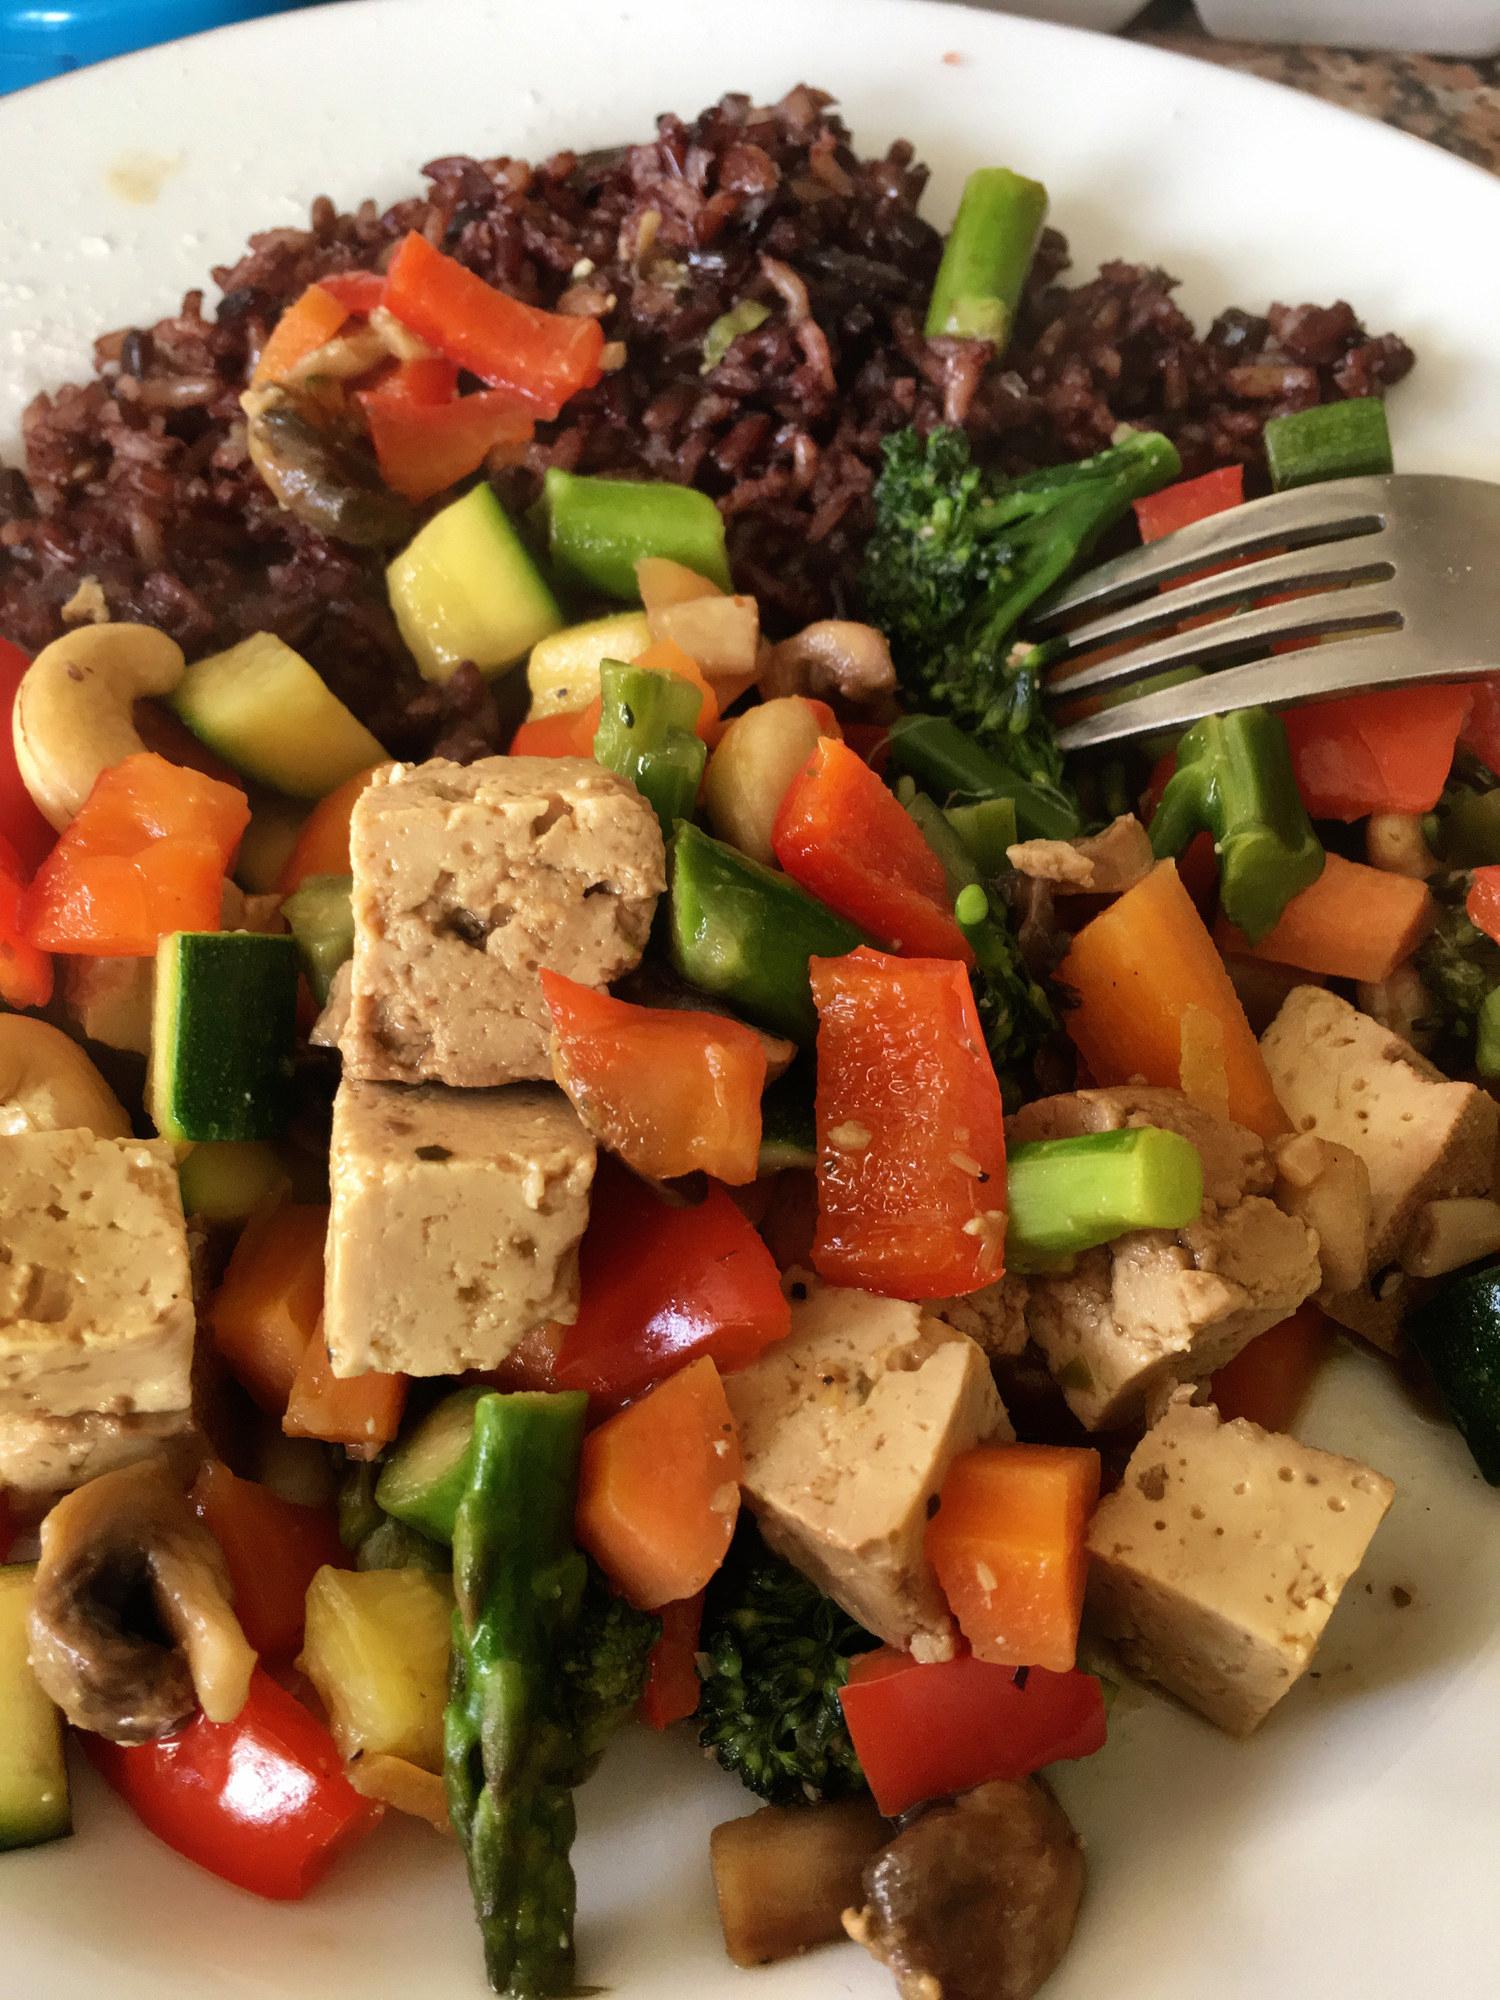 Tofu stir-fry with vegetables.